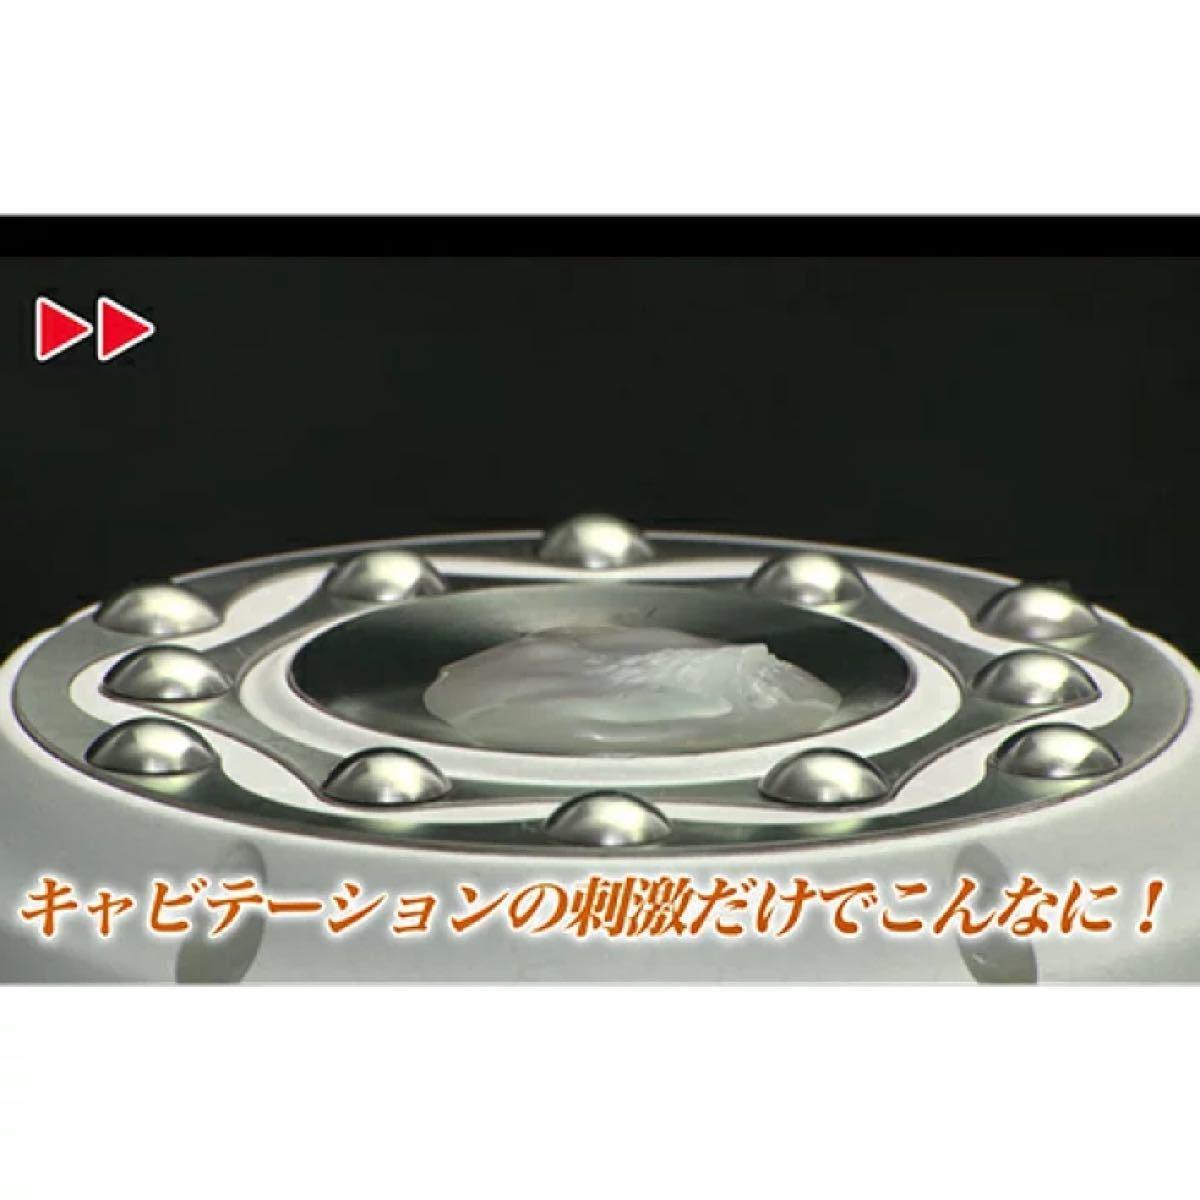 YA-MAN ヤーマン キャビスパRFコア EX